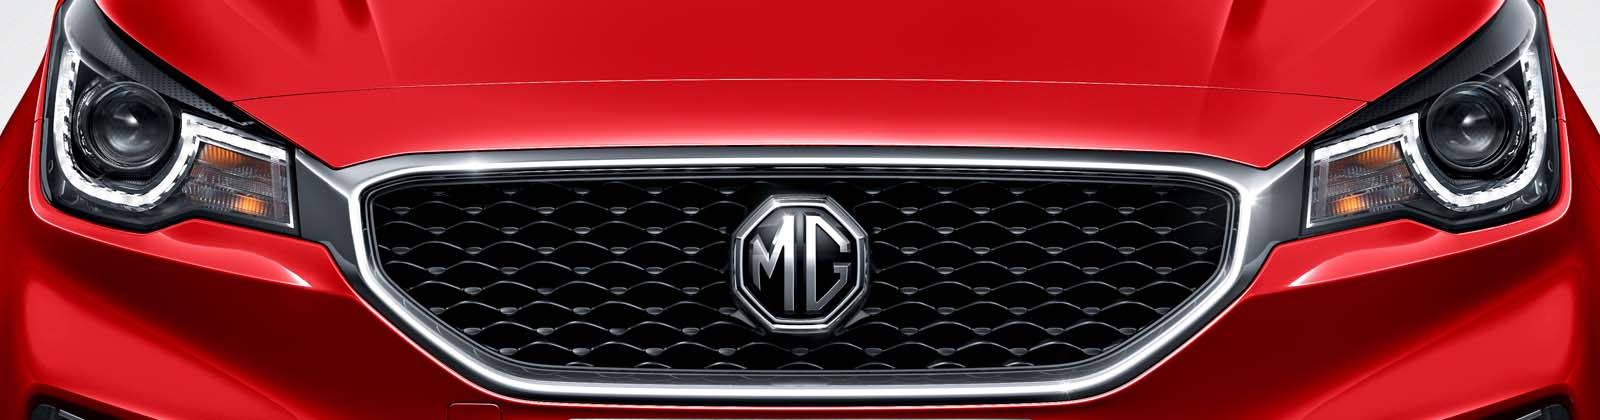 MG Motor Stock